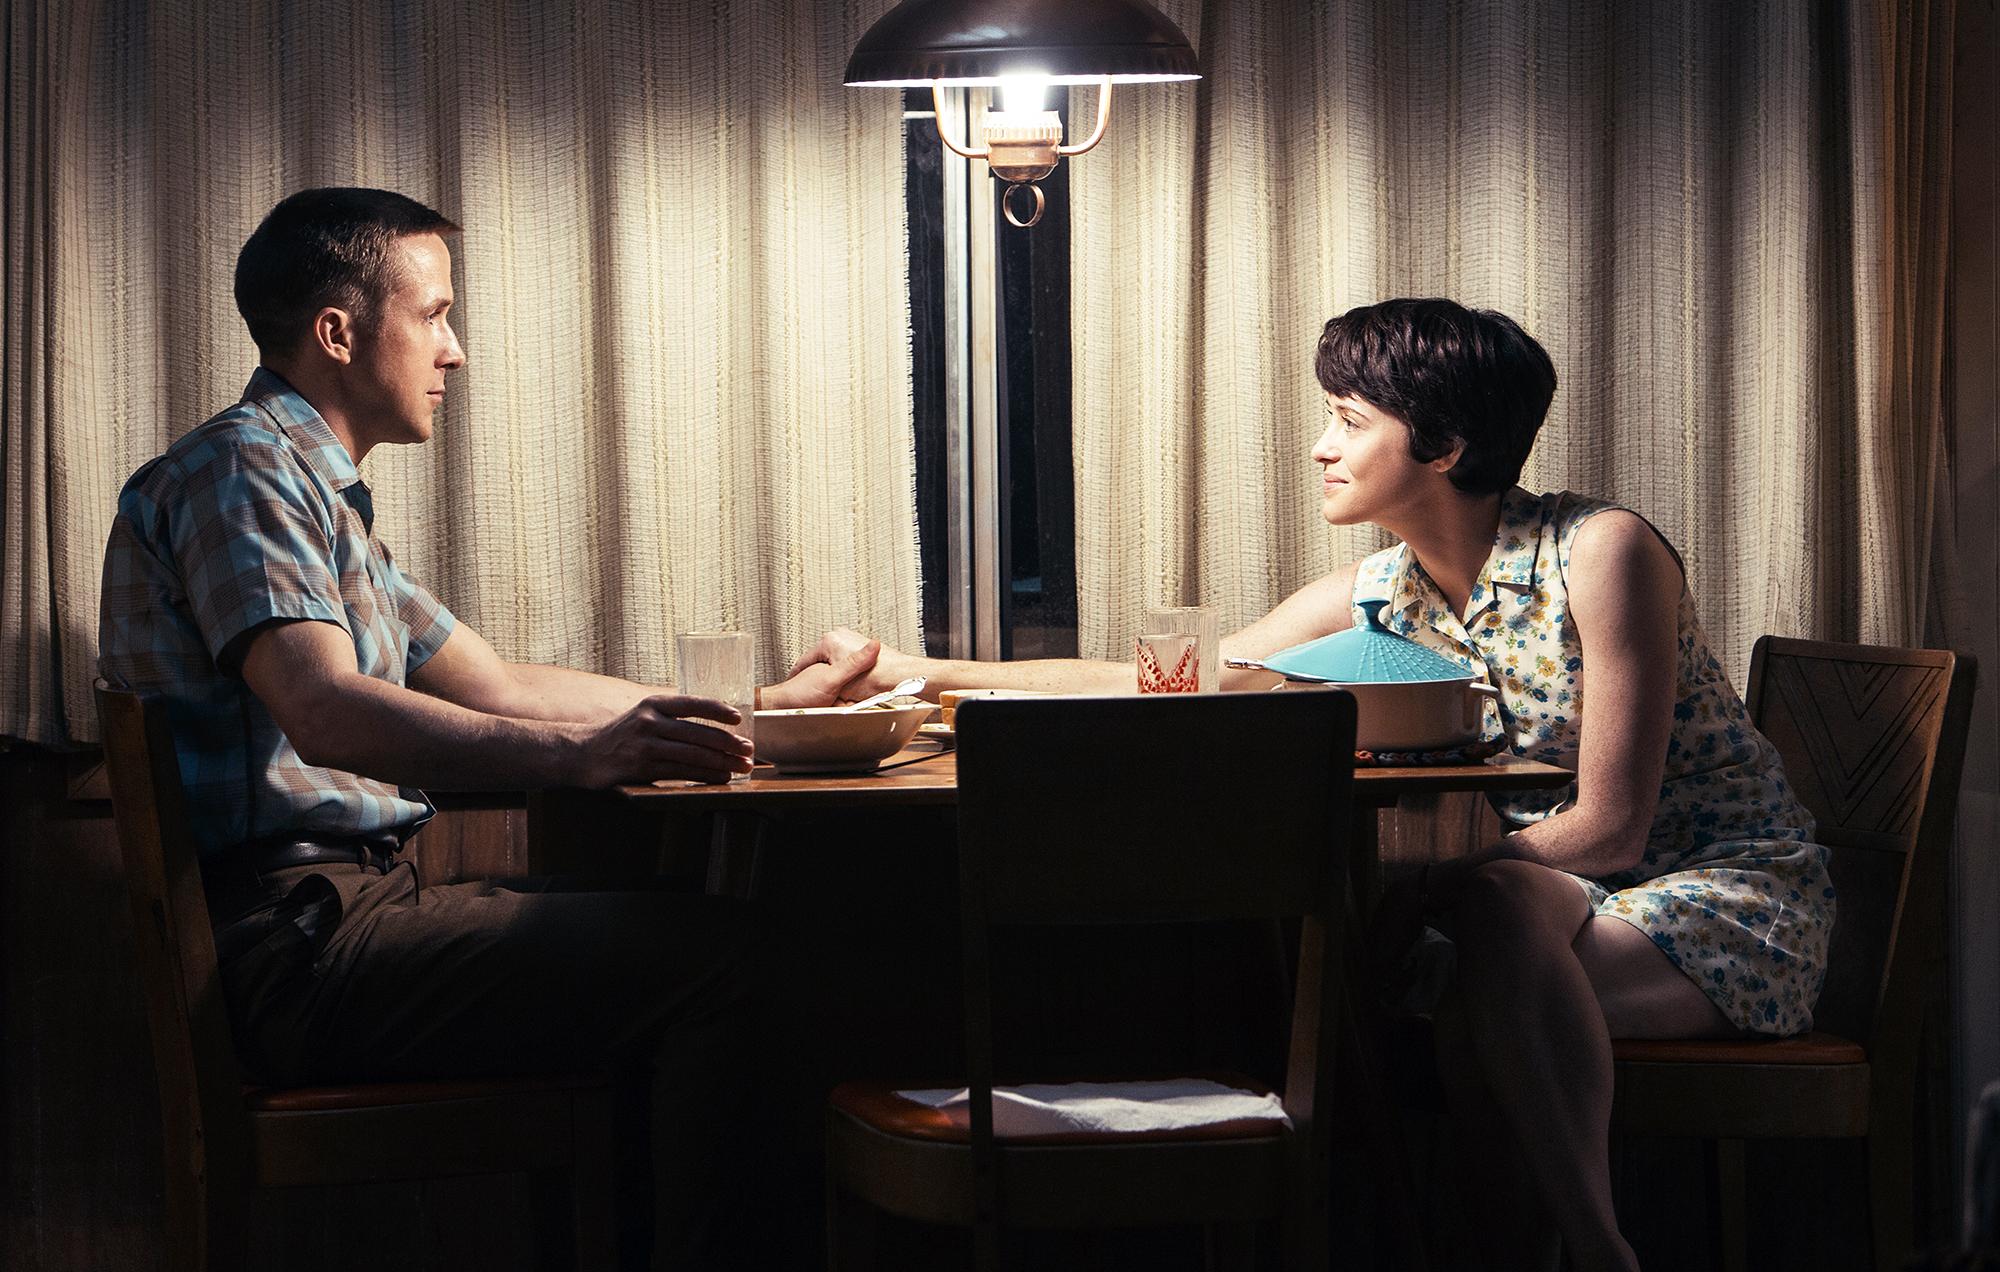 Ryan Gosling Claire Foy First Man Golden Globe Nominations - Ryan Gosling and Claire Foy in 'First Man.